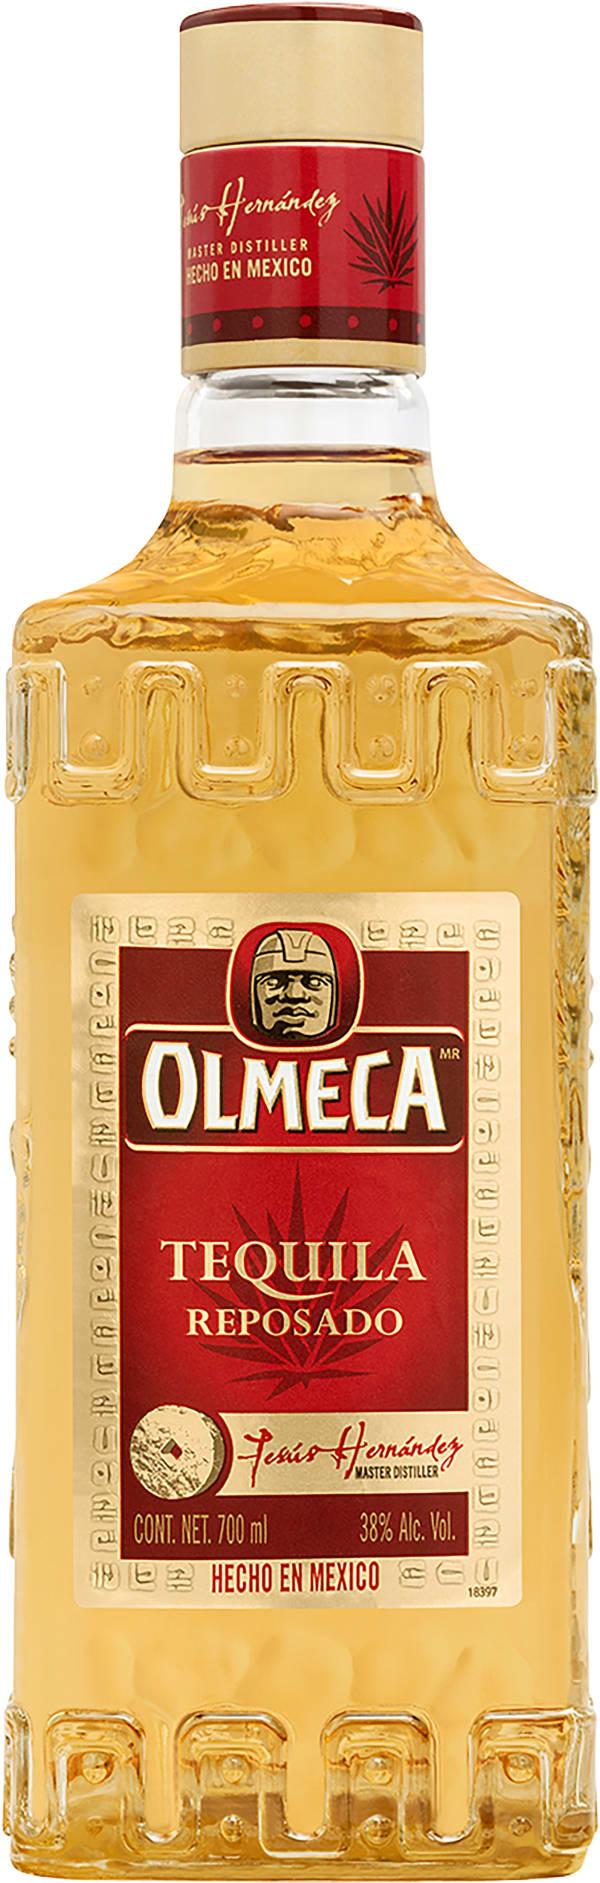 Olmeca Tequila Reposado